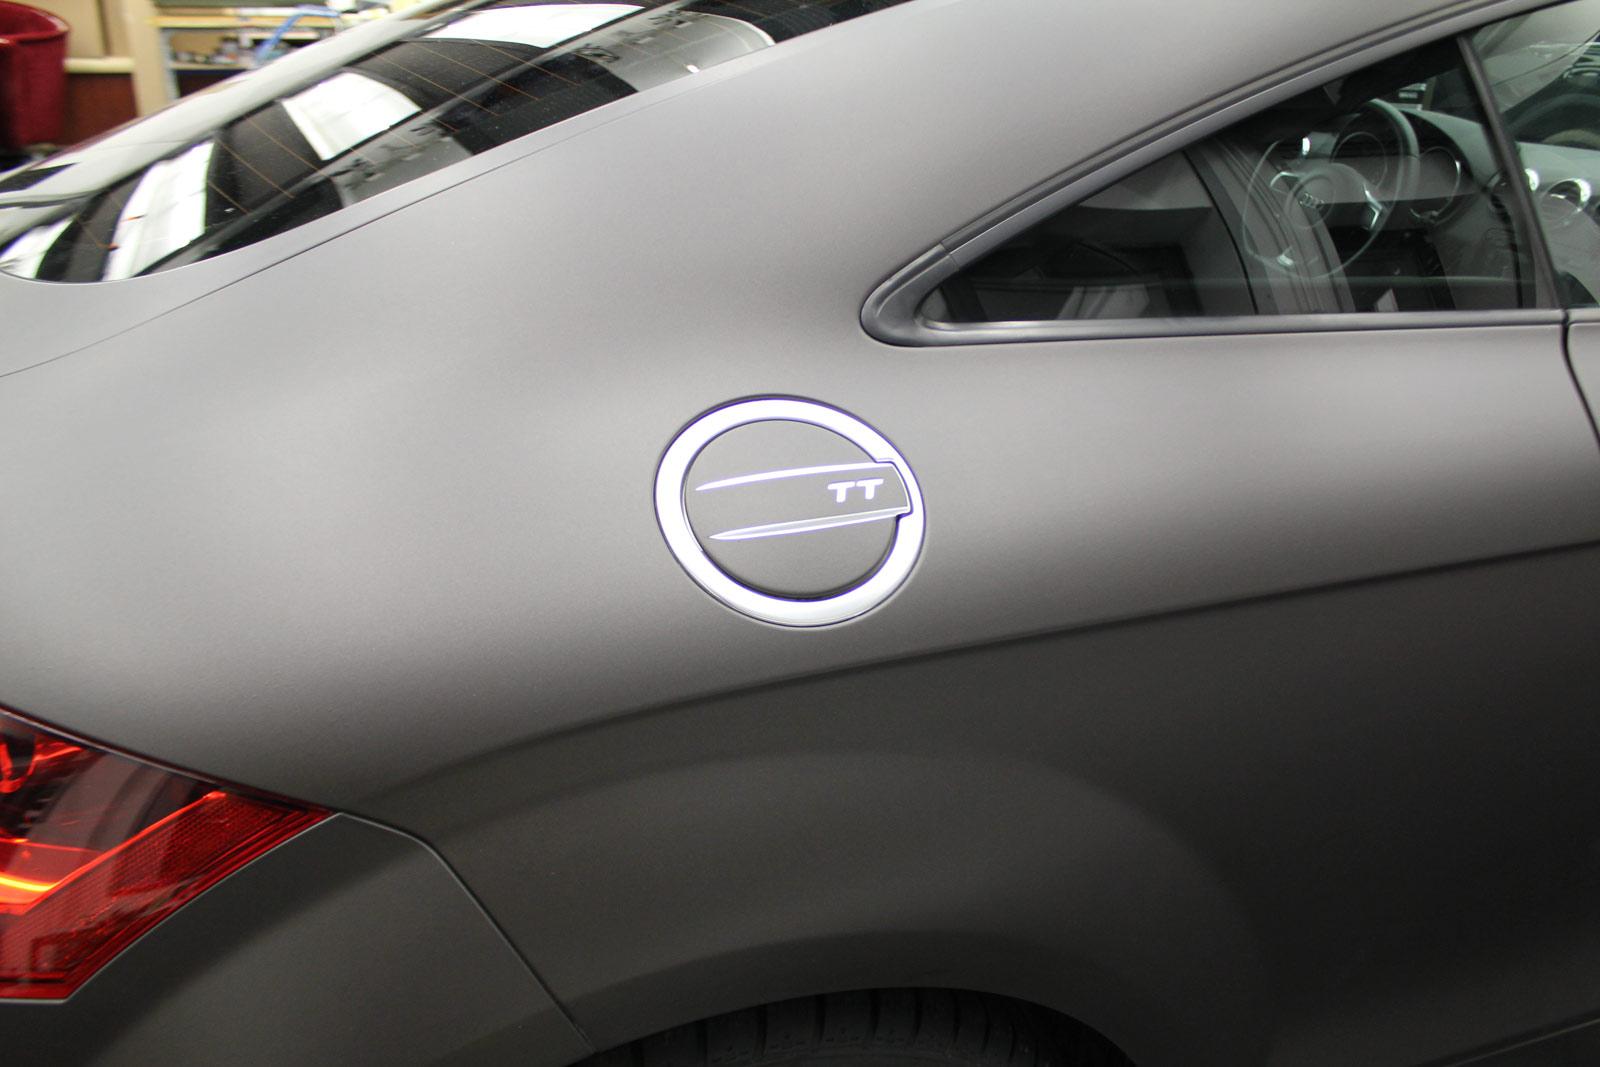 Audi_TT_Braun_Matt_Metallic_Branding_32